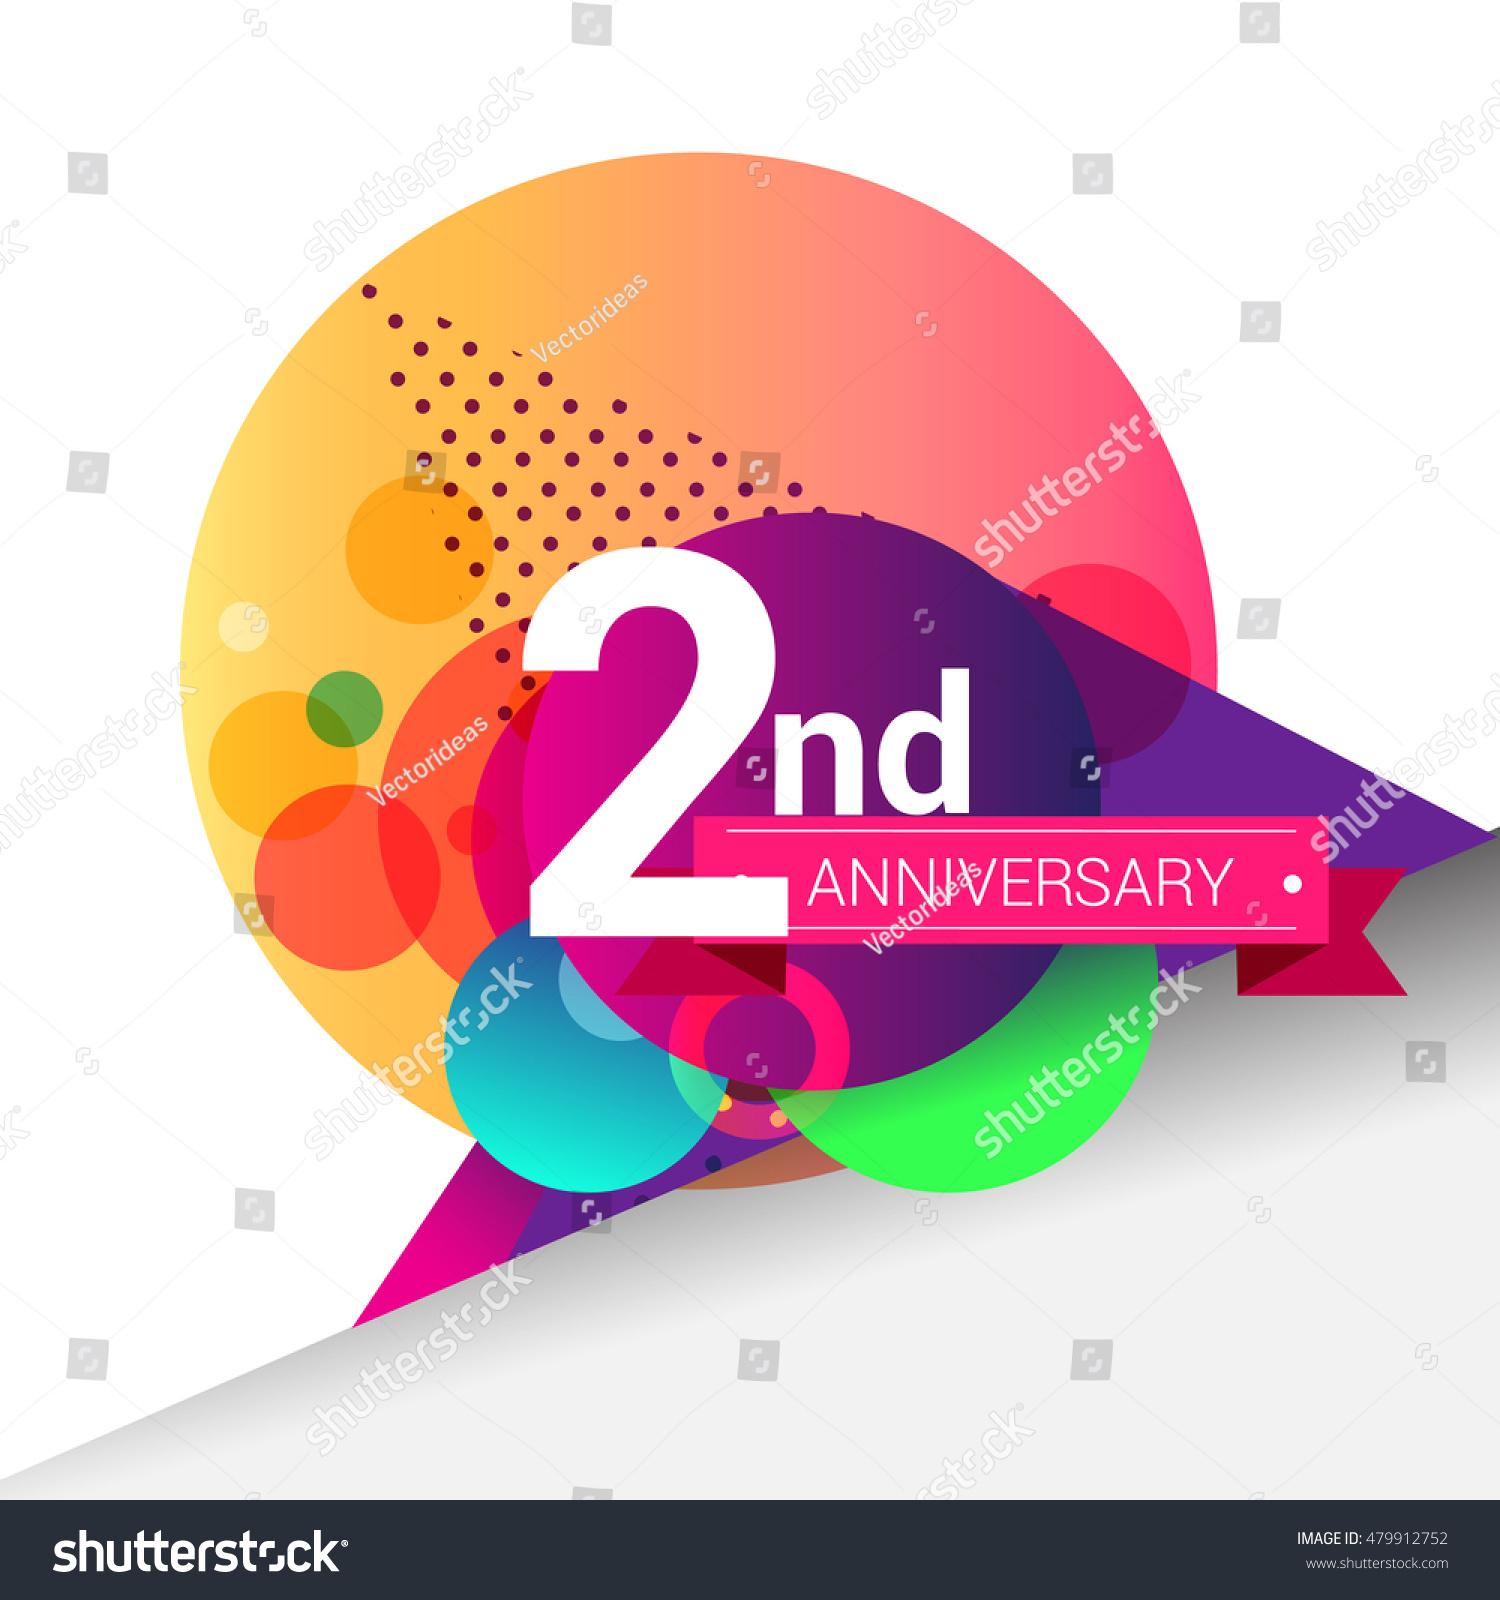 Nd anniversary logo colorful geometric background stock